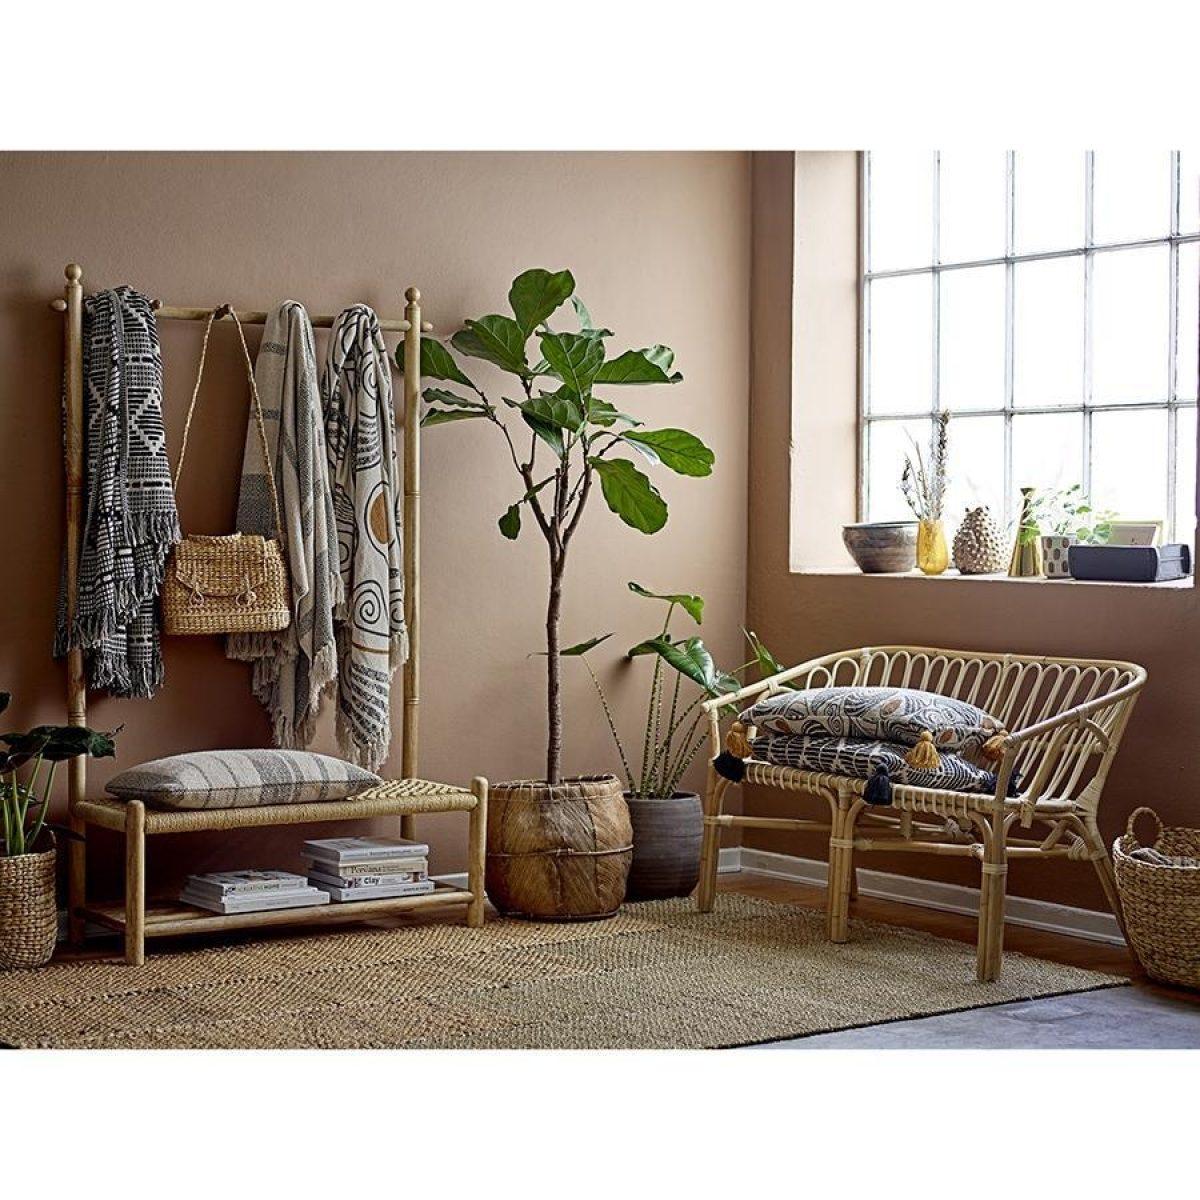 Bloomingville Recycled Cotton Mix Blanket Throw Black White82049671 2 900x900